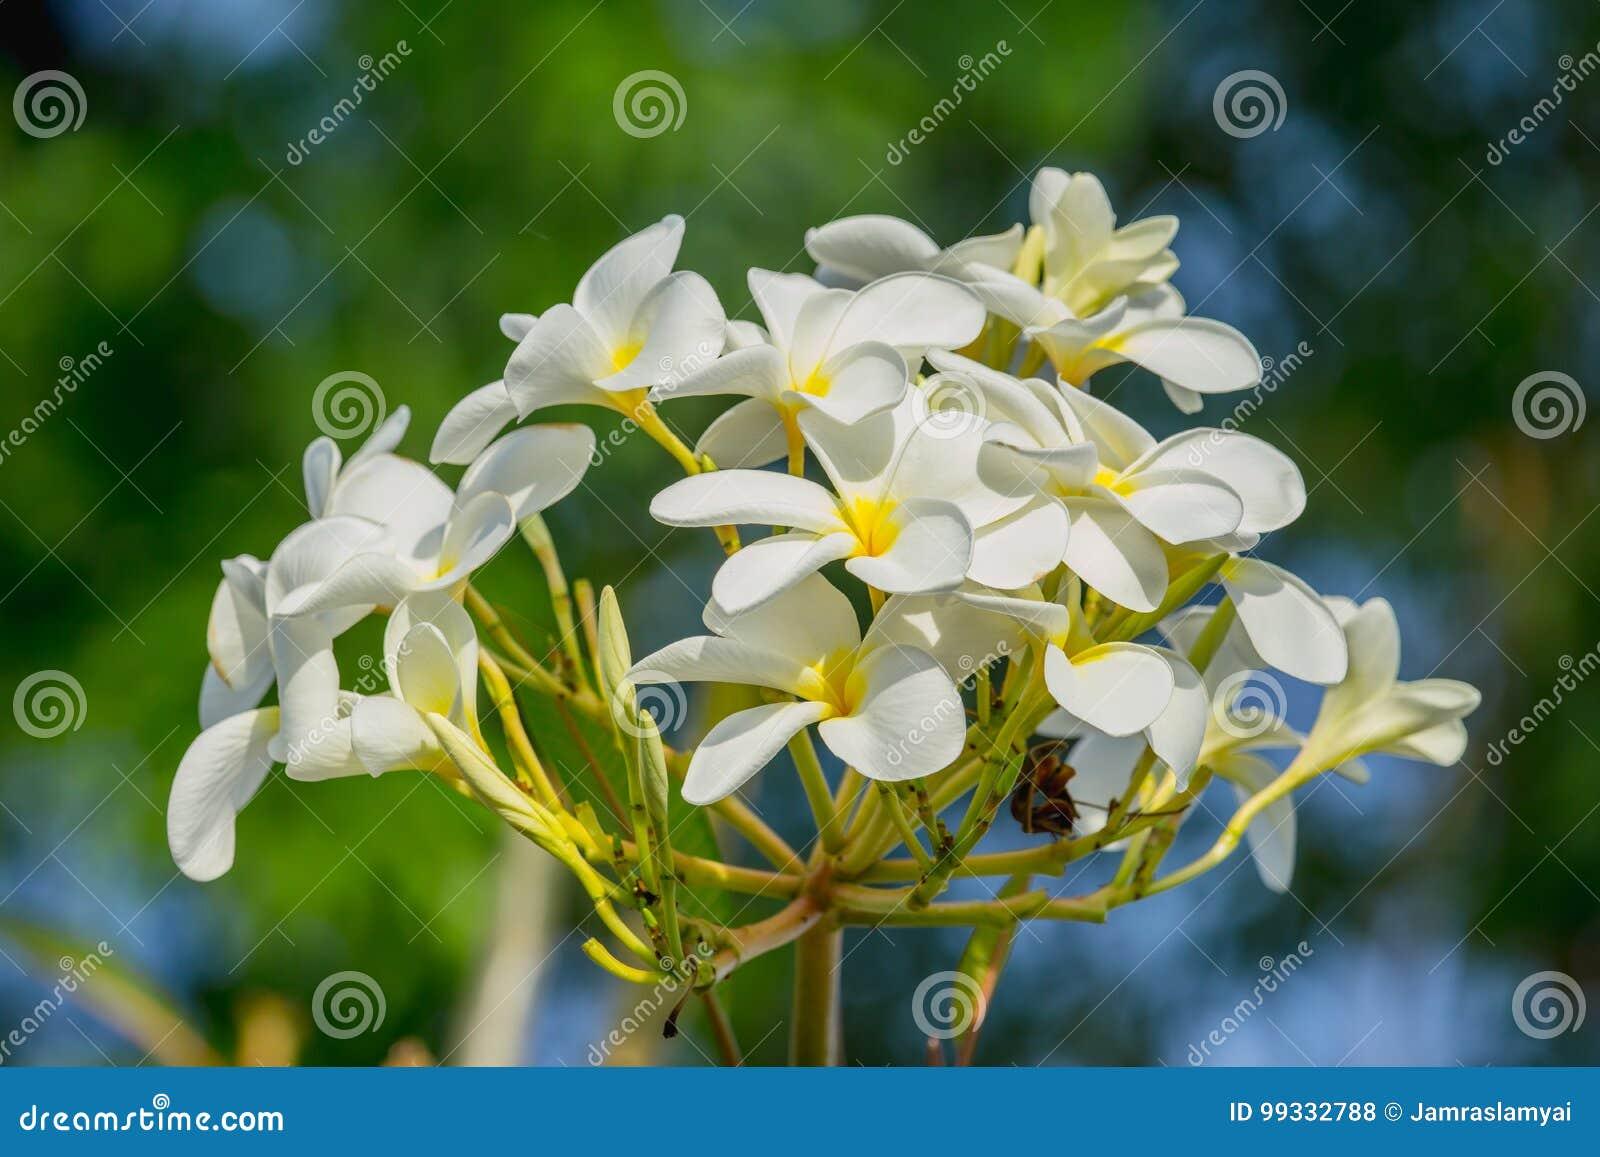 Close Up Plumeria White Flower Adenium Tropical Flower Stock Photo